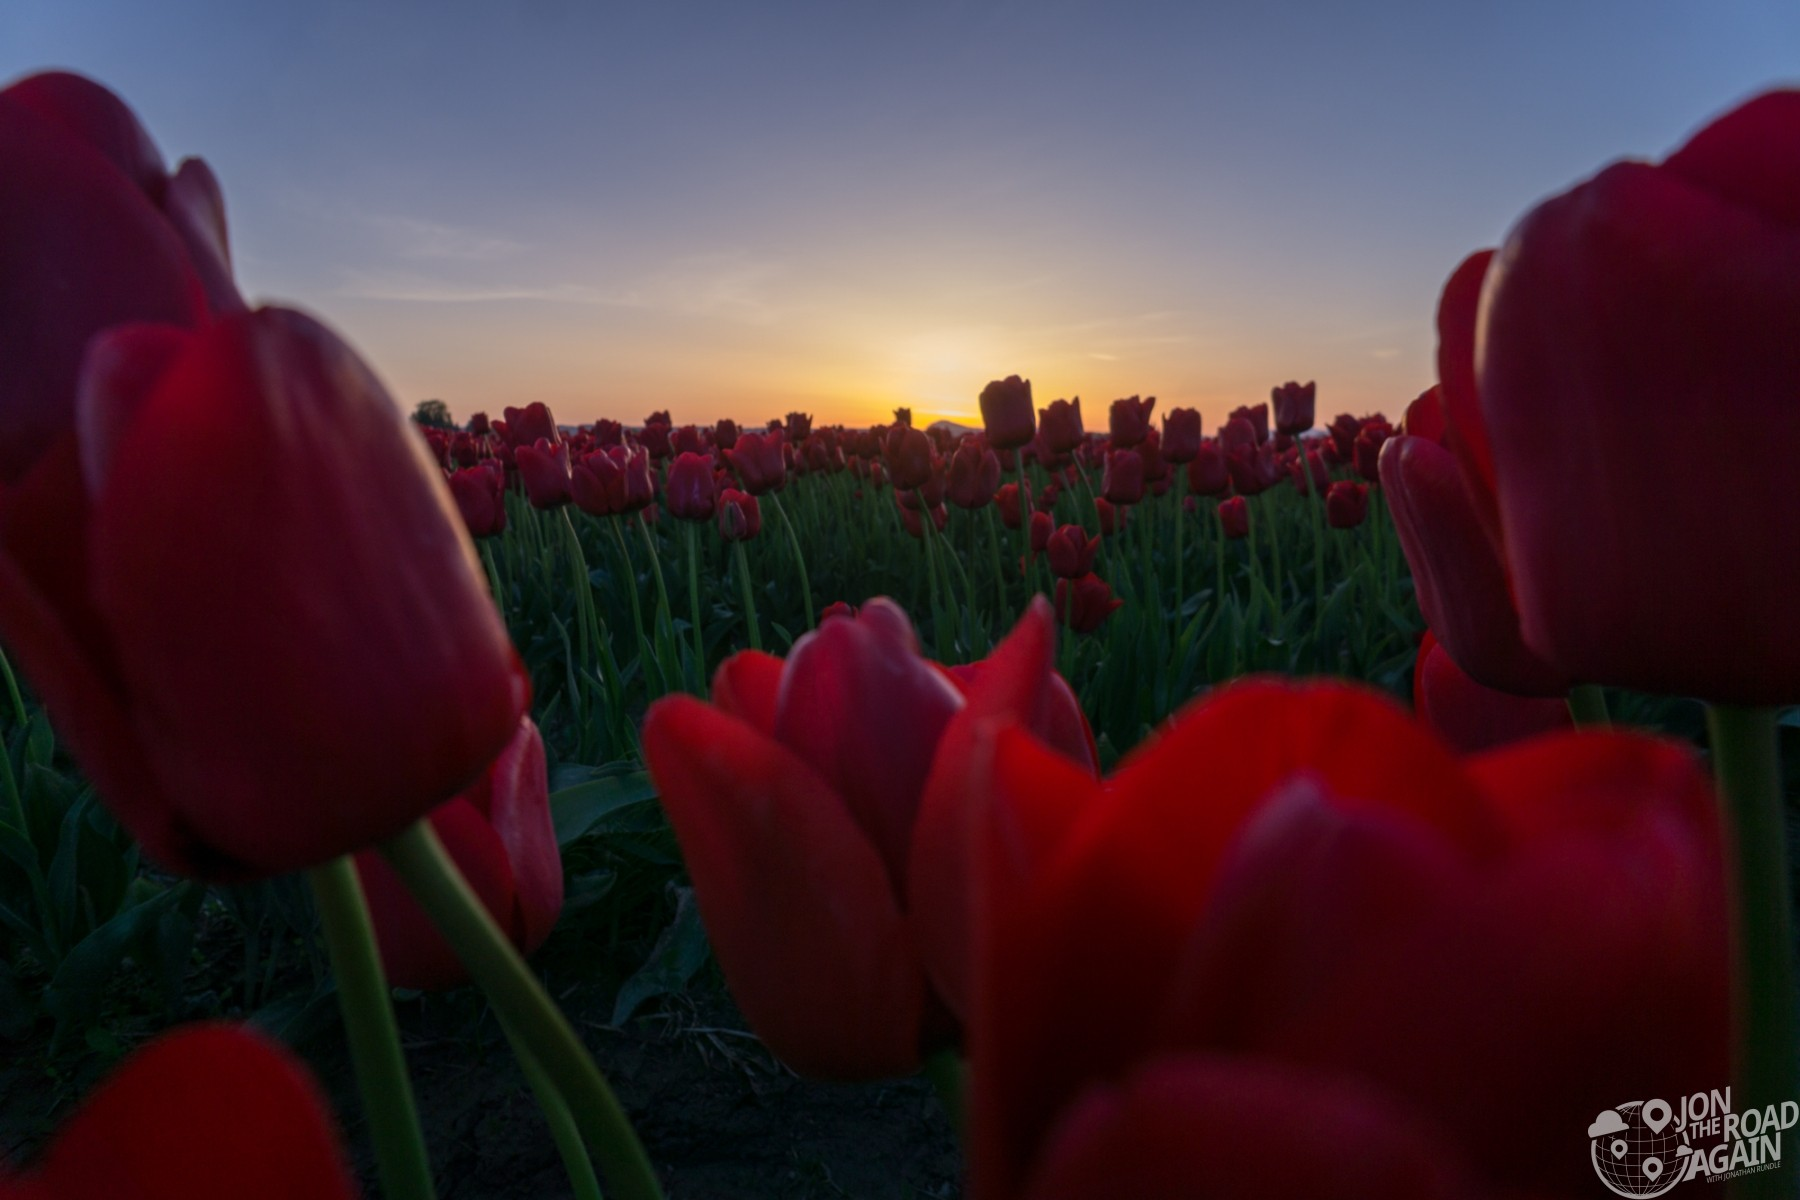 Skagit Valley Tulip Festival Sunset